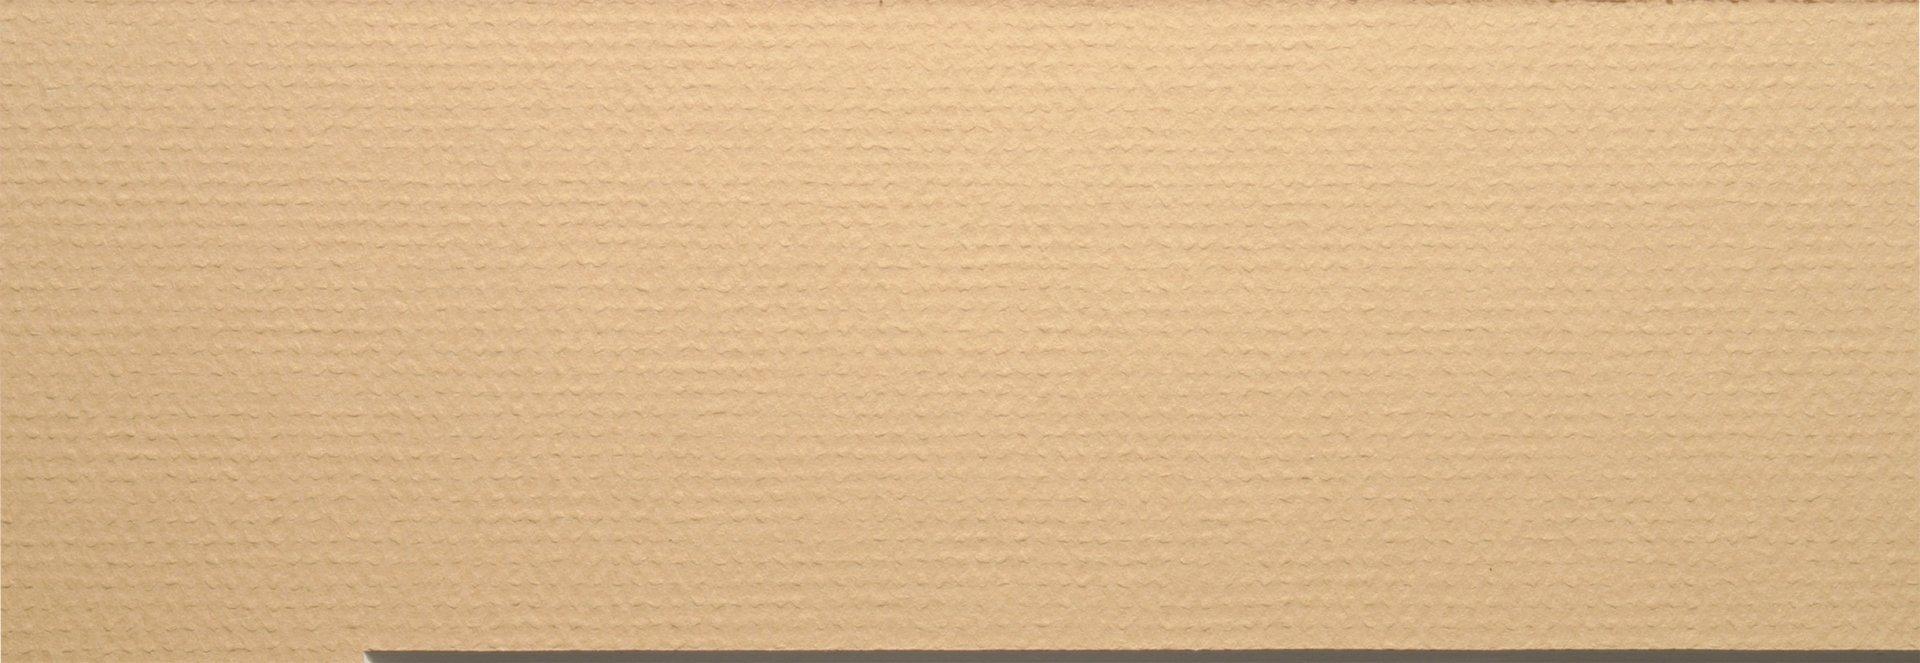 SRM 1061 Sandstone